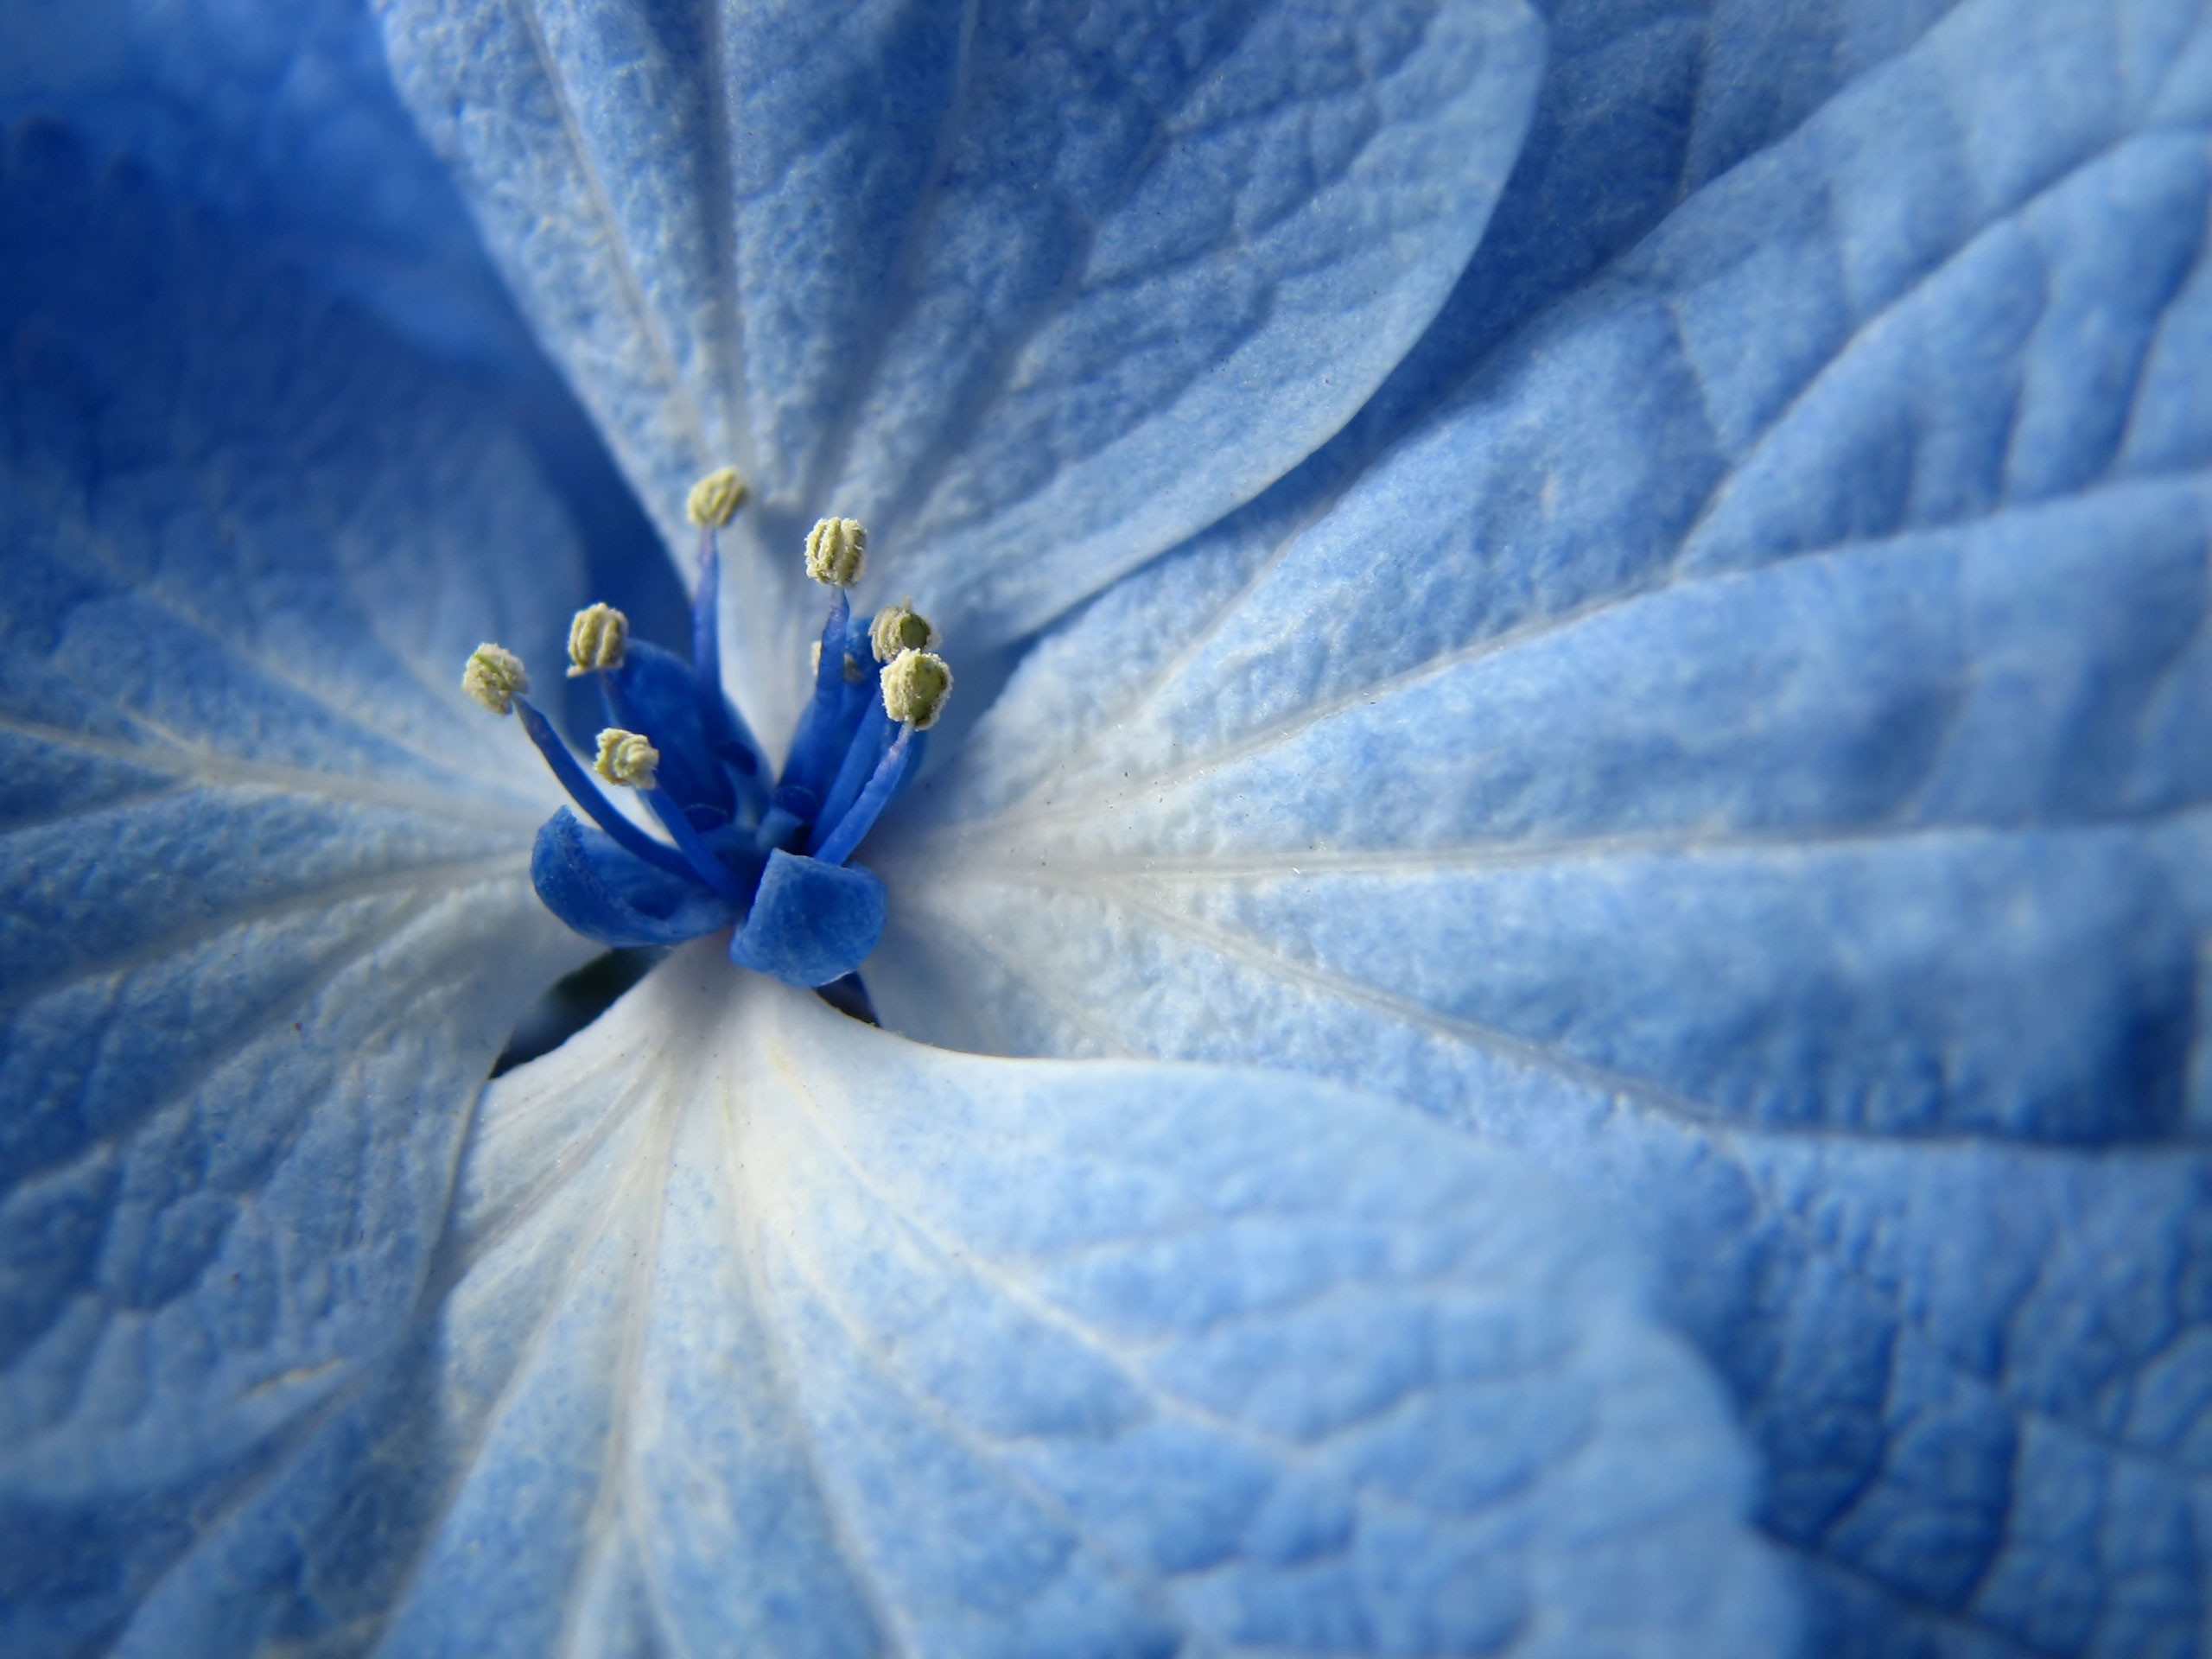 Computer Dark Blue Flowers Wallpapers, Desktop Backgrounds Id